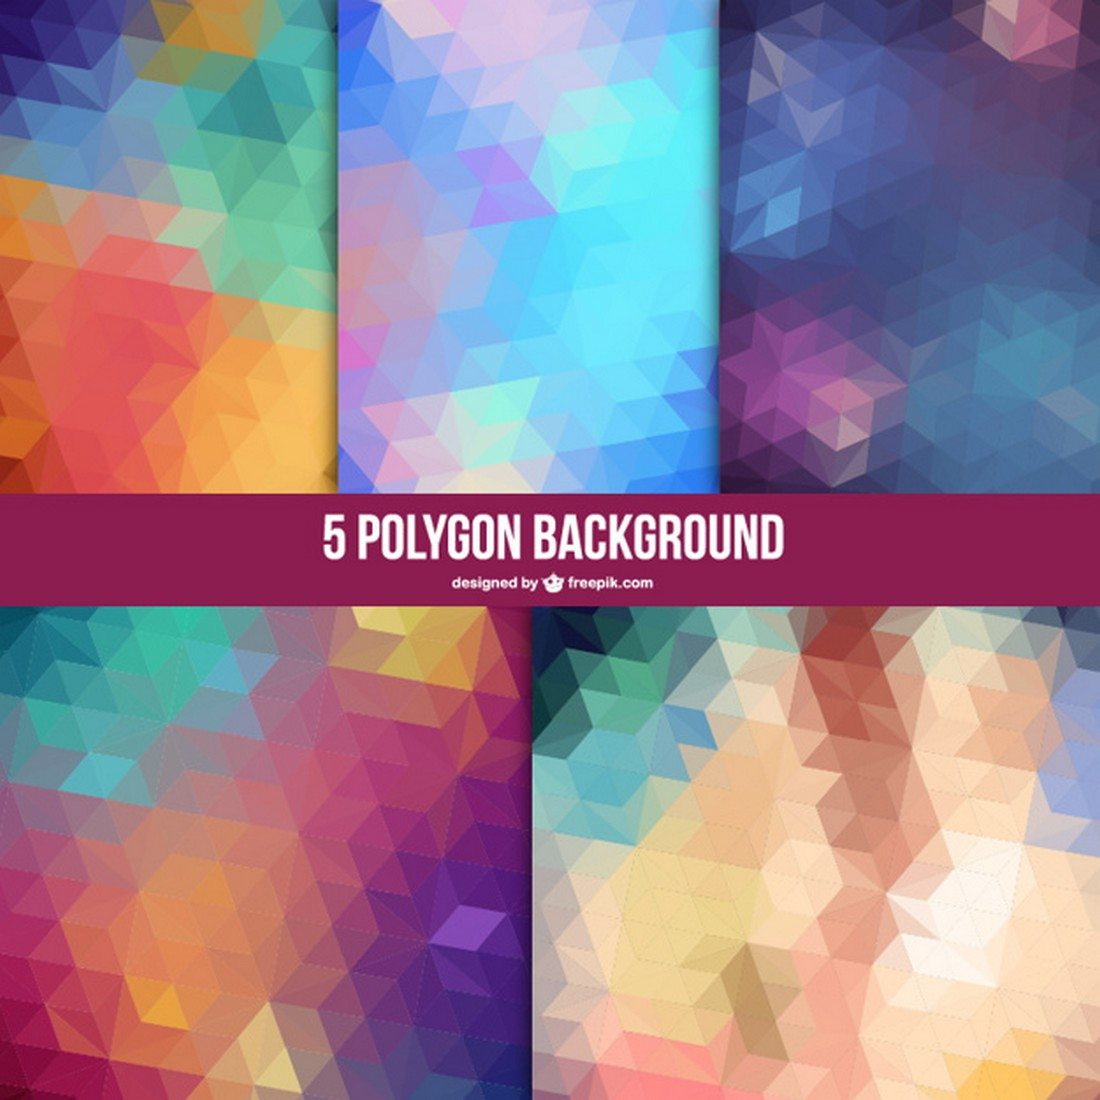 Geometric-Backgrounds-Set 20+ Beautiful Geometric & Polygon Background Textures design tips